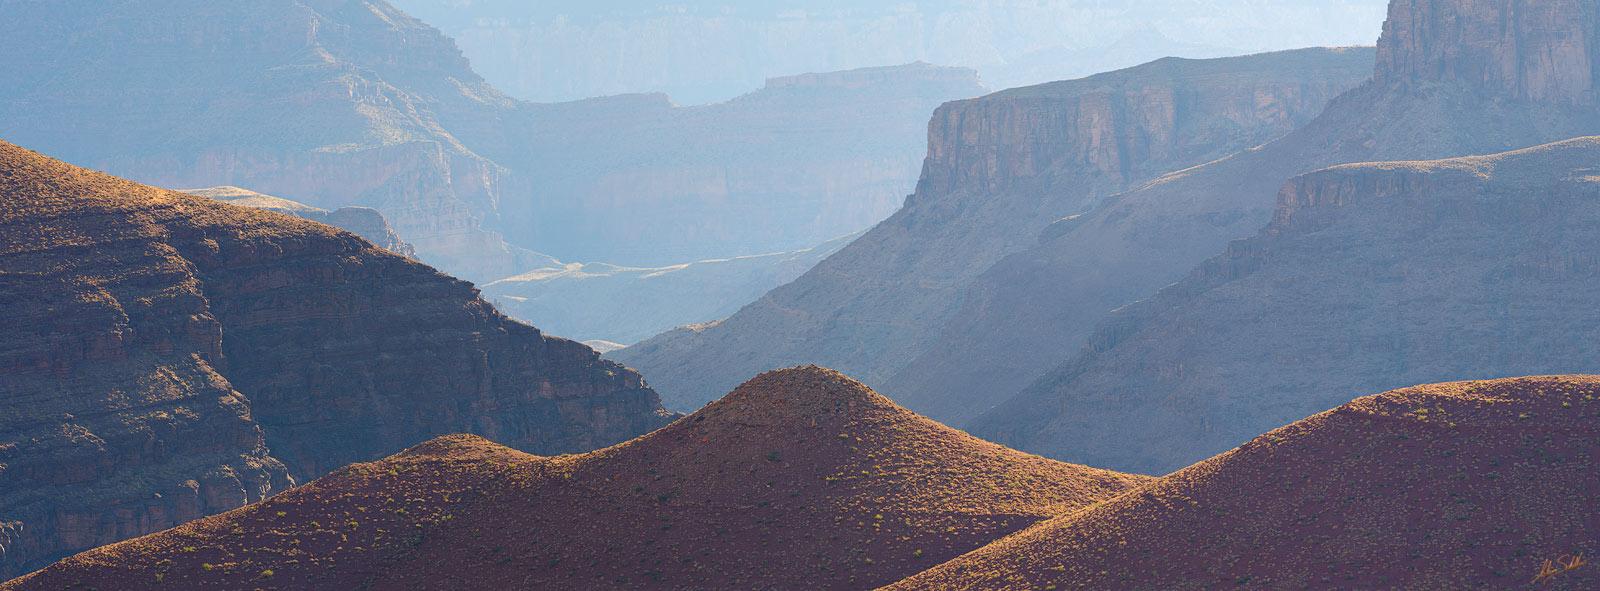 AZ, Arizona, Below the Rim, Escalante Route, Expedition, FujiFilm, GFX, GFX 100, Grand Canyon, Hilltop Ruin, National Park, River Trip, photo